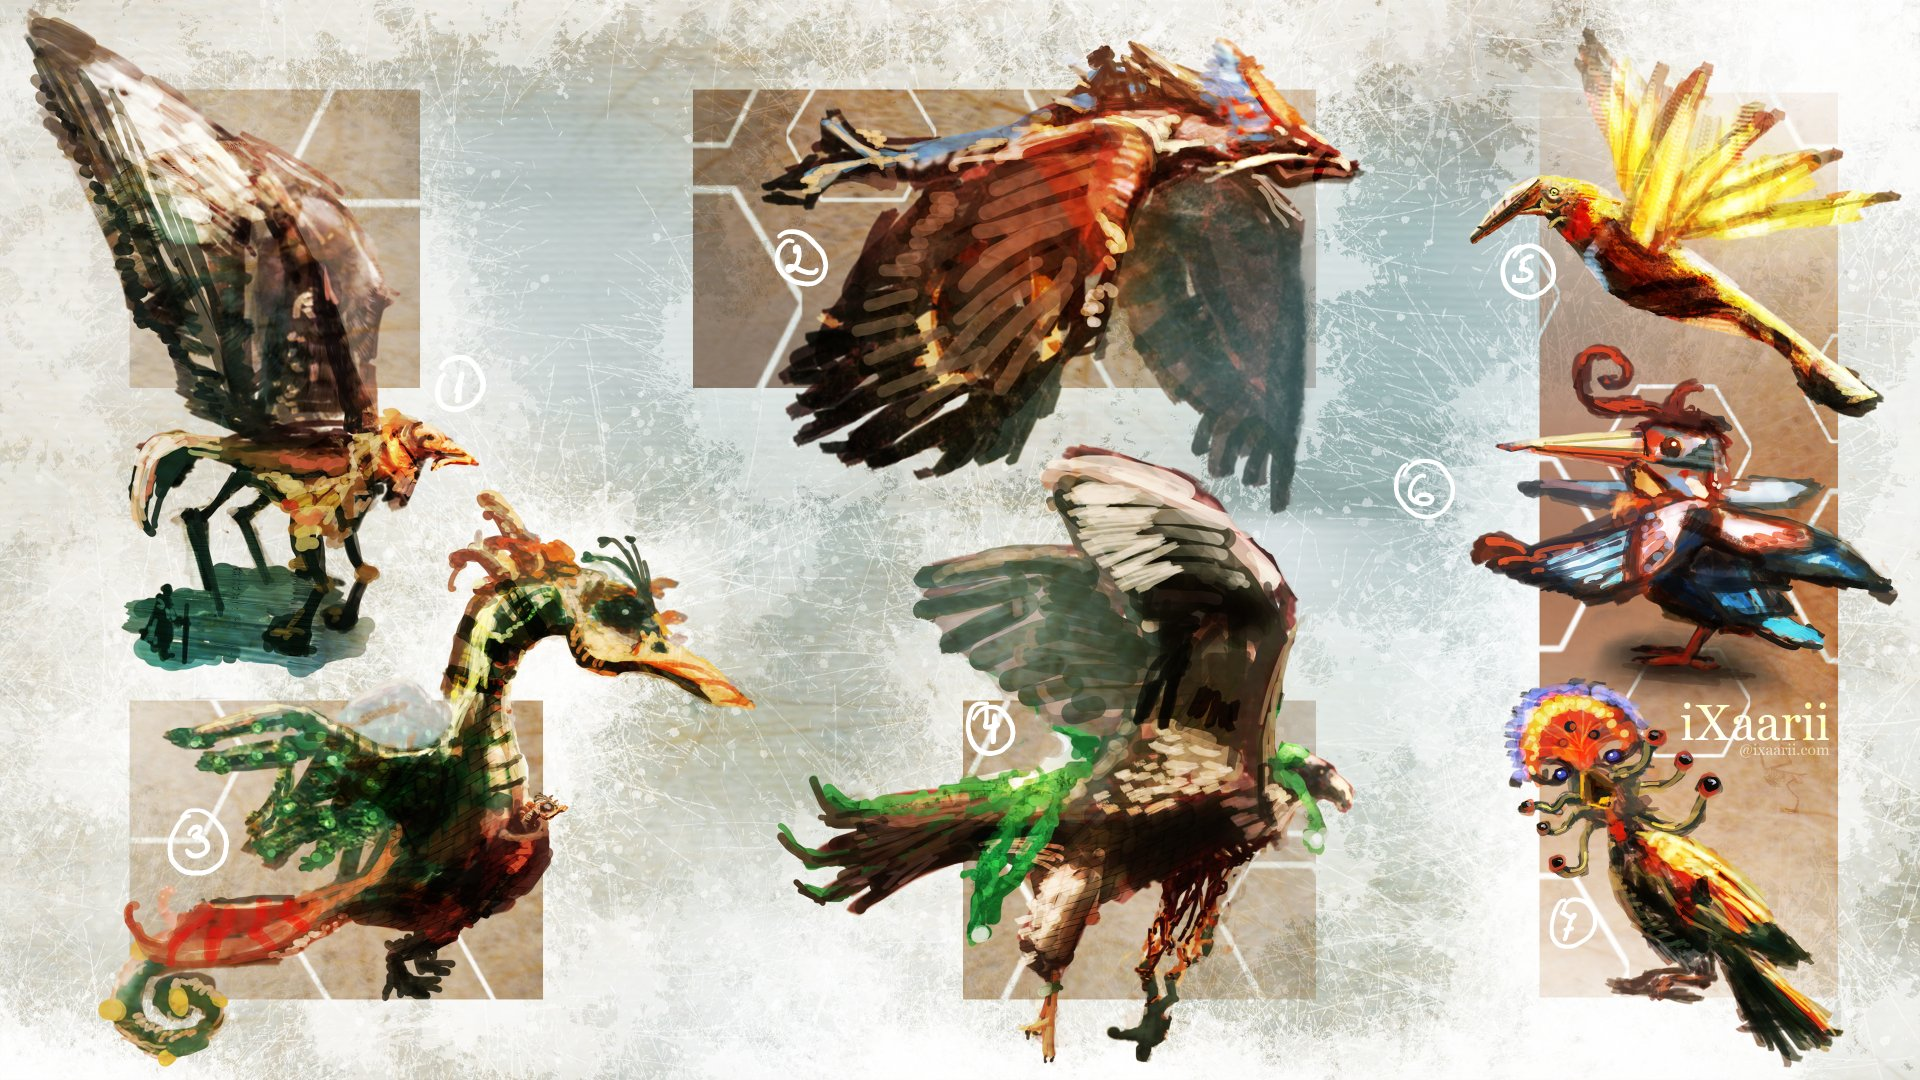 Bildquelle:http://www.ixaarii.com/wp-content/upz/2013/02/Alien-Birds ...